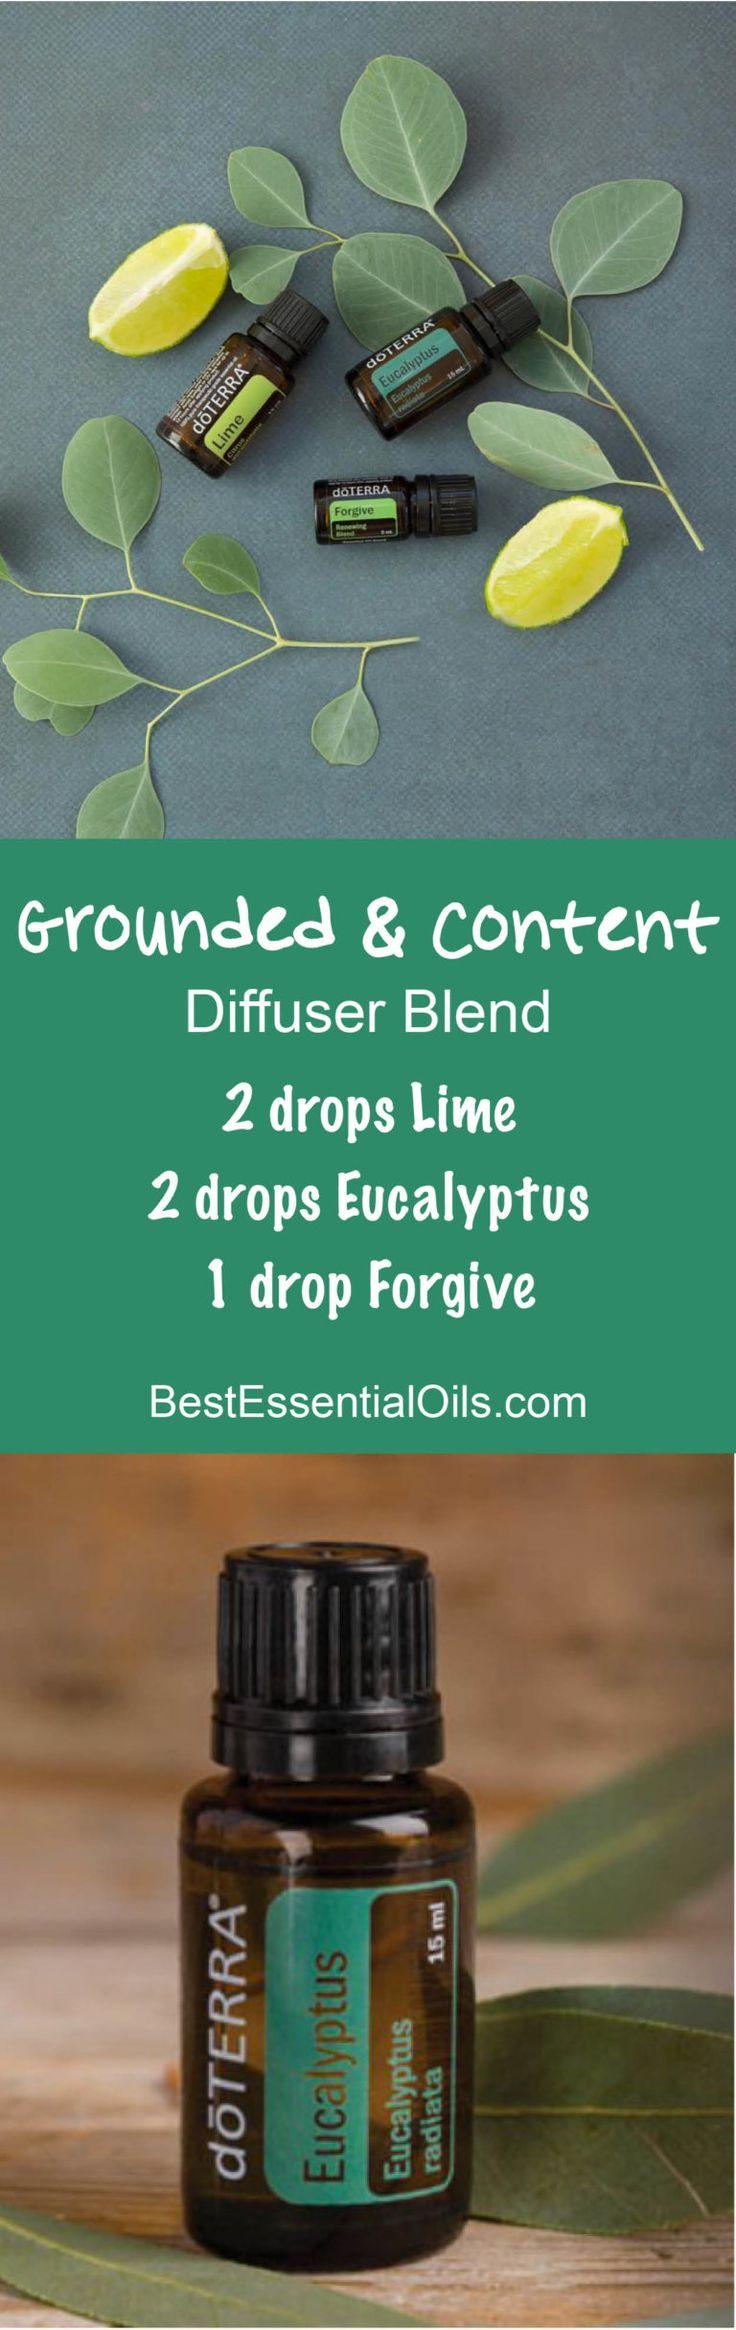 92 best oils images on Pinterest | Doterra essential oils, Essential ...